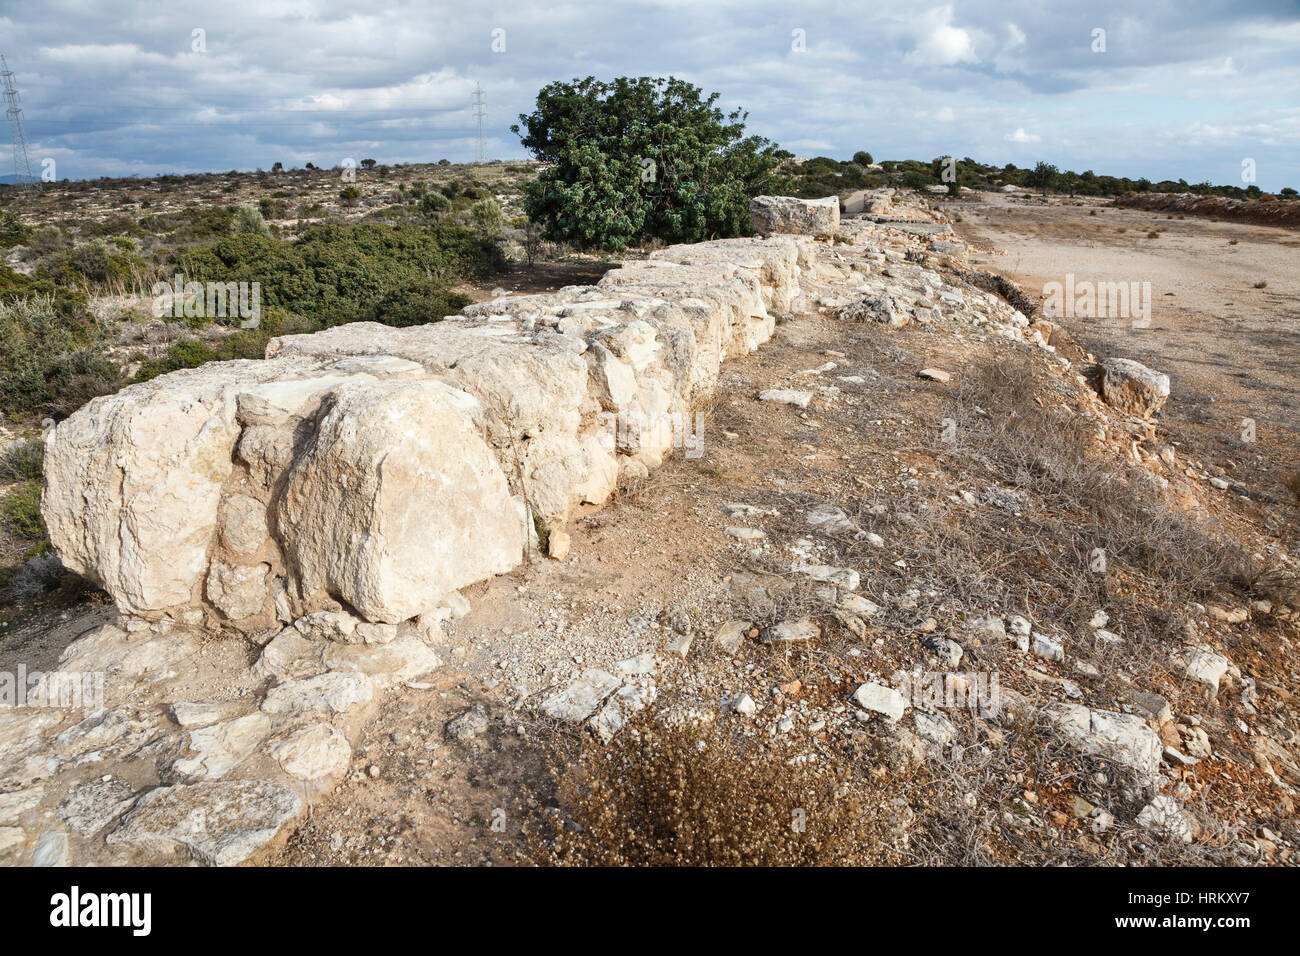 The stadium - the remains of a Roman hippodrome, Kourion, Cyprus Stock Photo